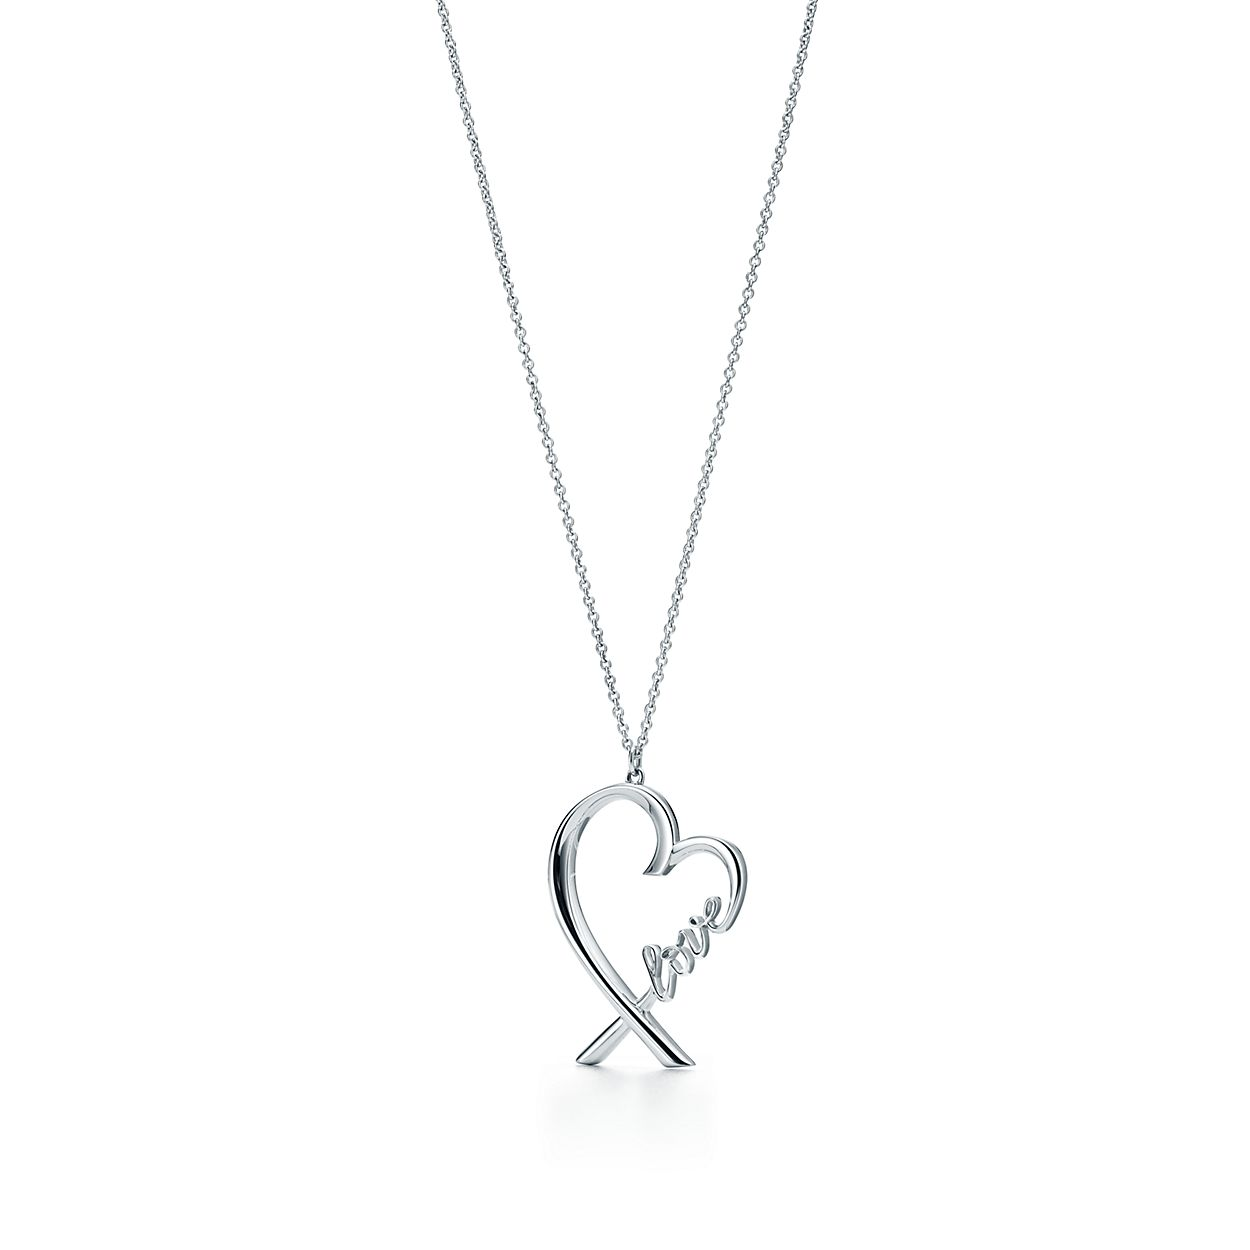 Paloma picasso loving heart love pendant in sterling silver paloma picassoloving heartbrlove pendant aloadofball Images